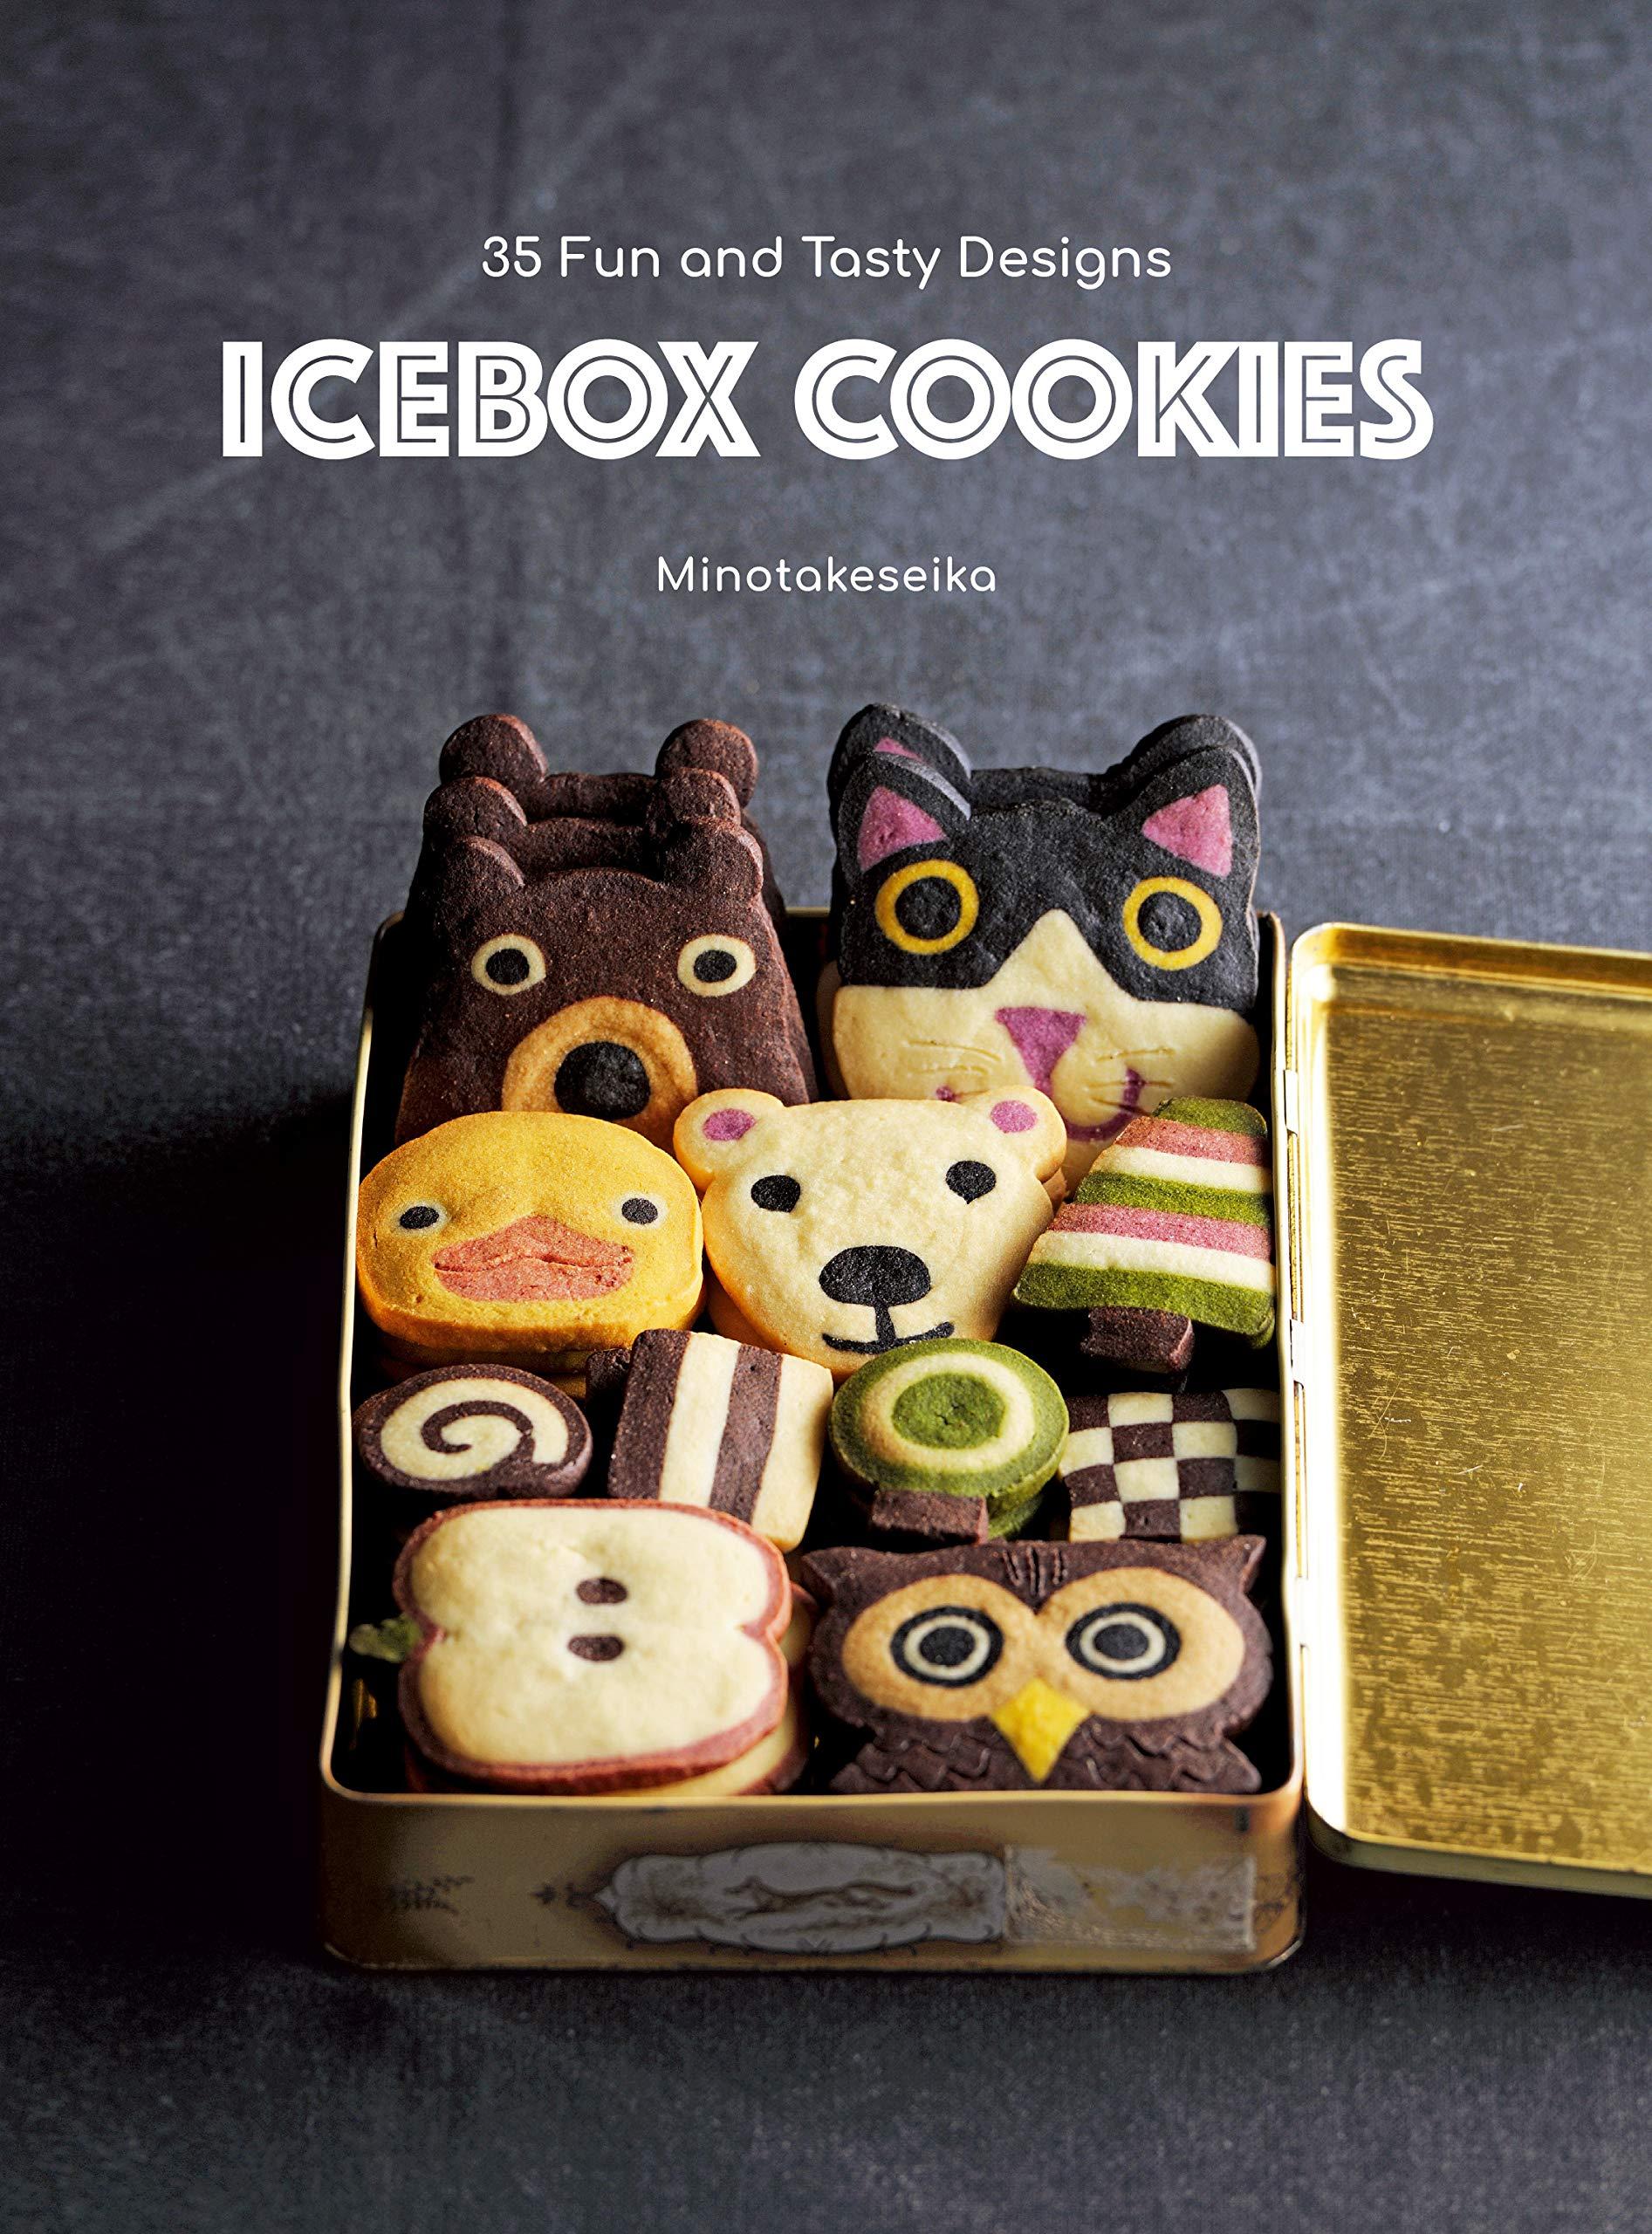 Icebox Cookies 35 Fun And Tasty Designs Minotakeseika